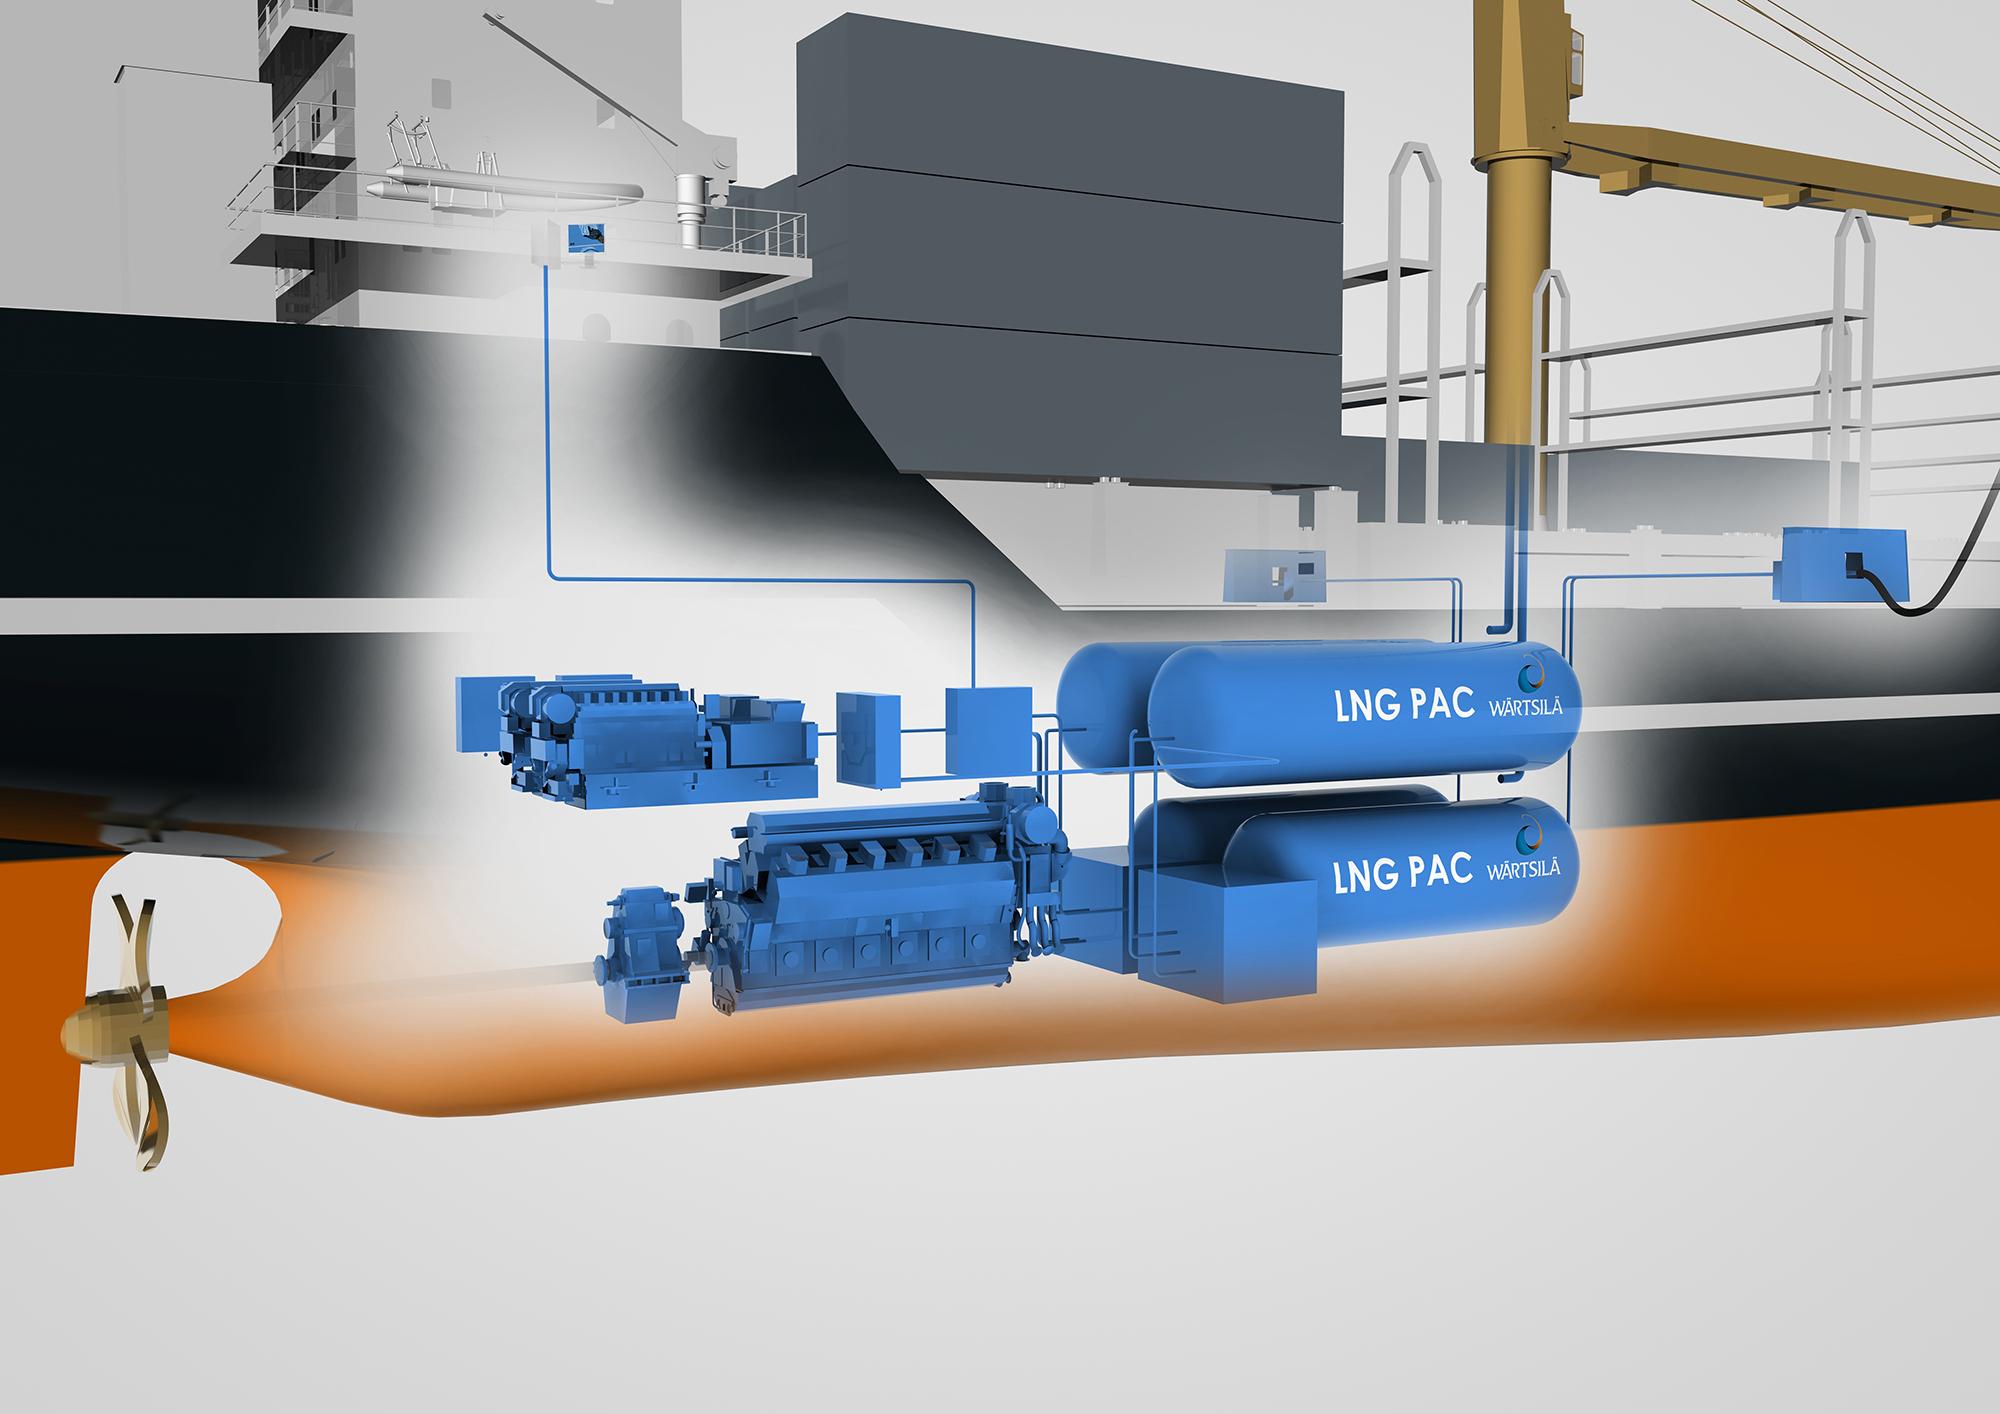 Boil Off Gas Handling Onboard Lng Fuelled Ships